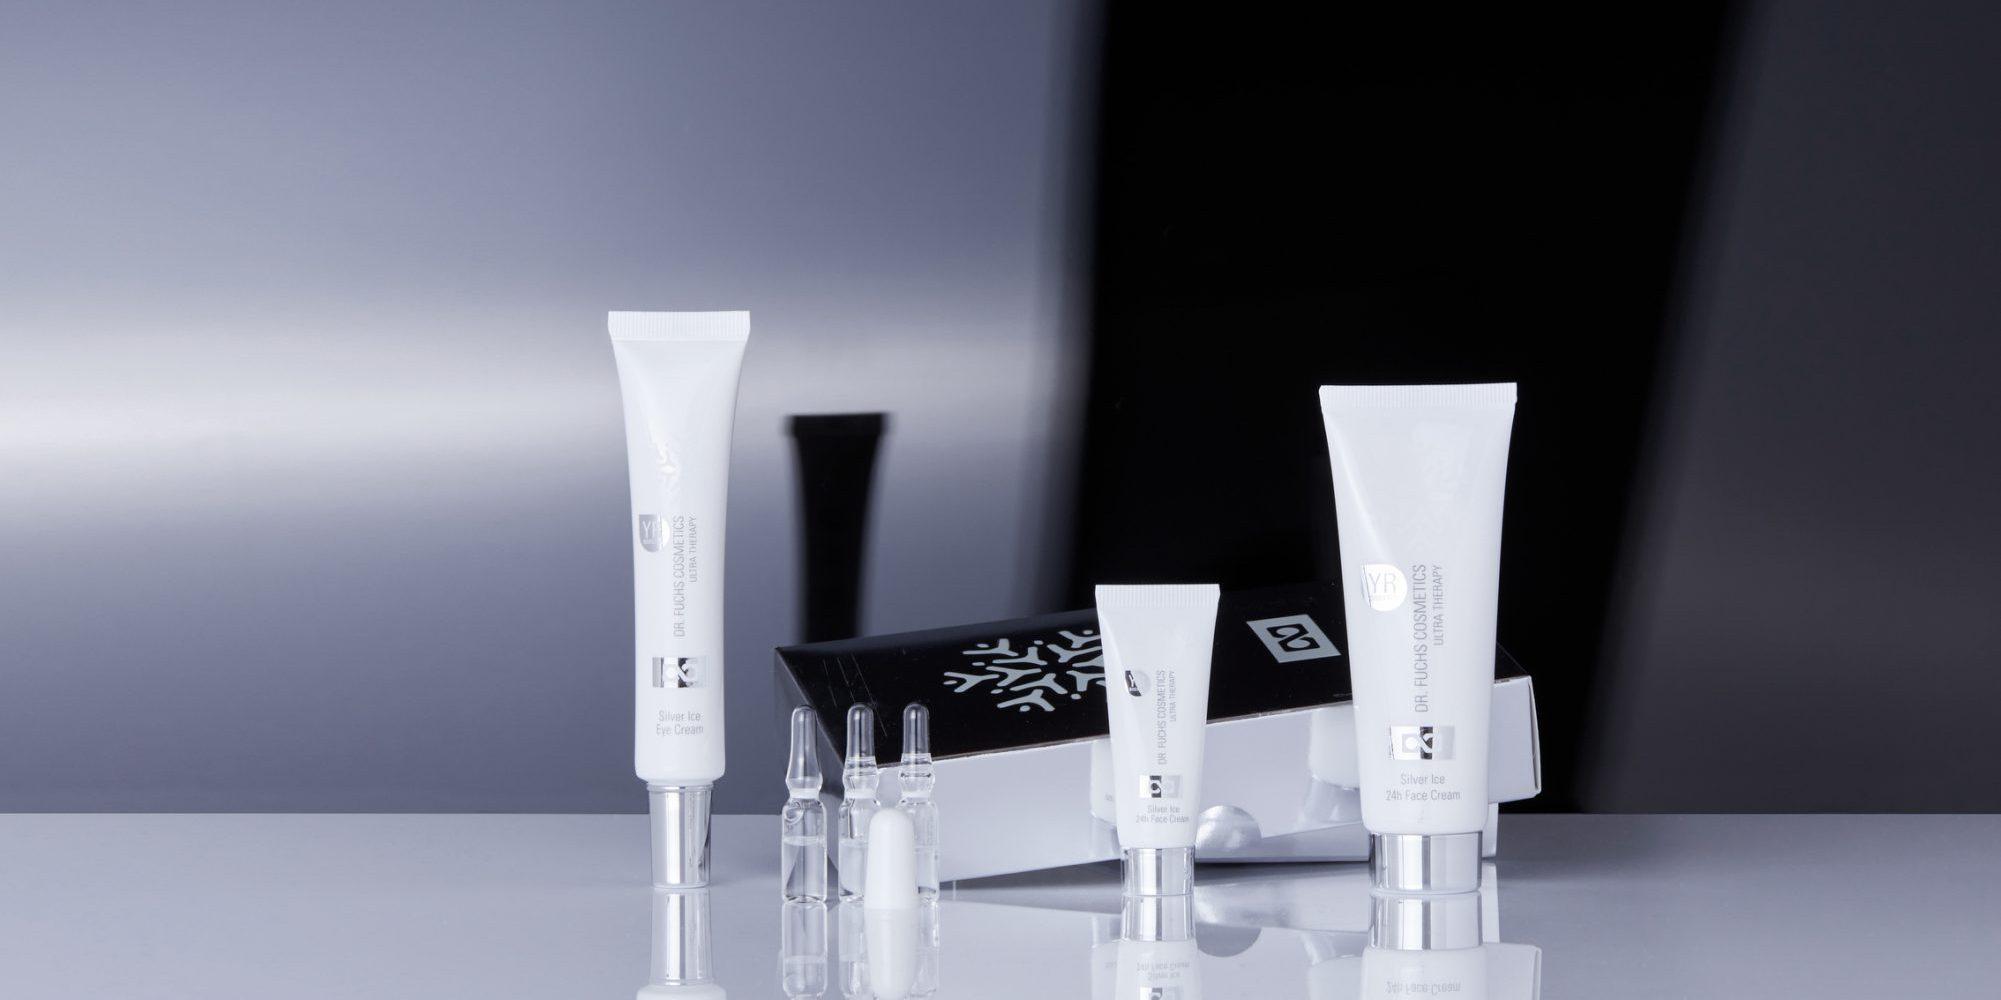 Produktfoto aller Produkte der Dr. Fuchs Cosmetics Ultra Therapy Silver Ice